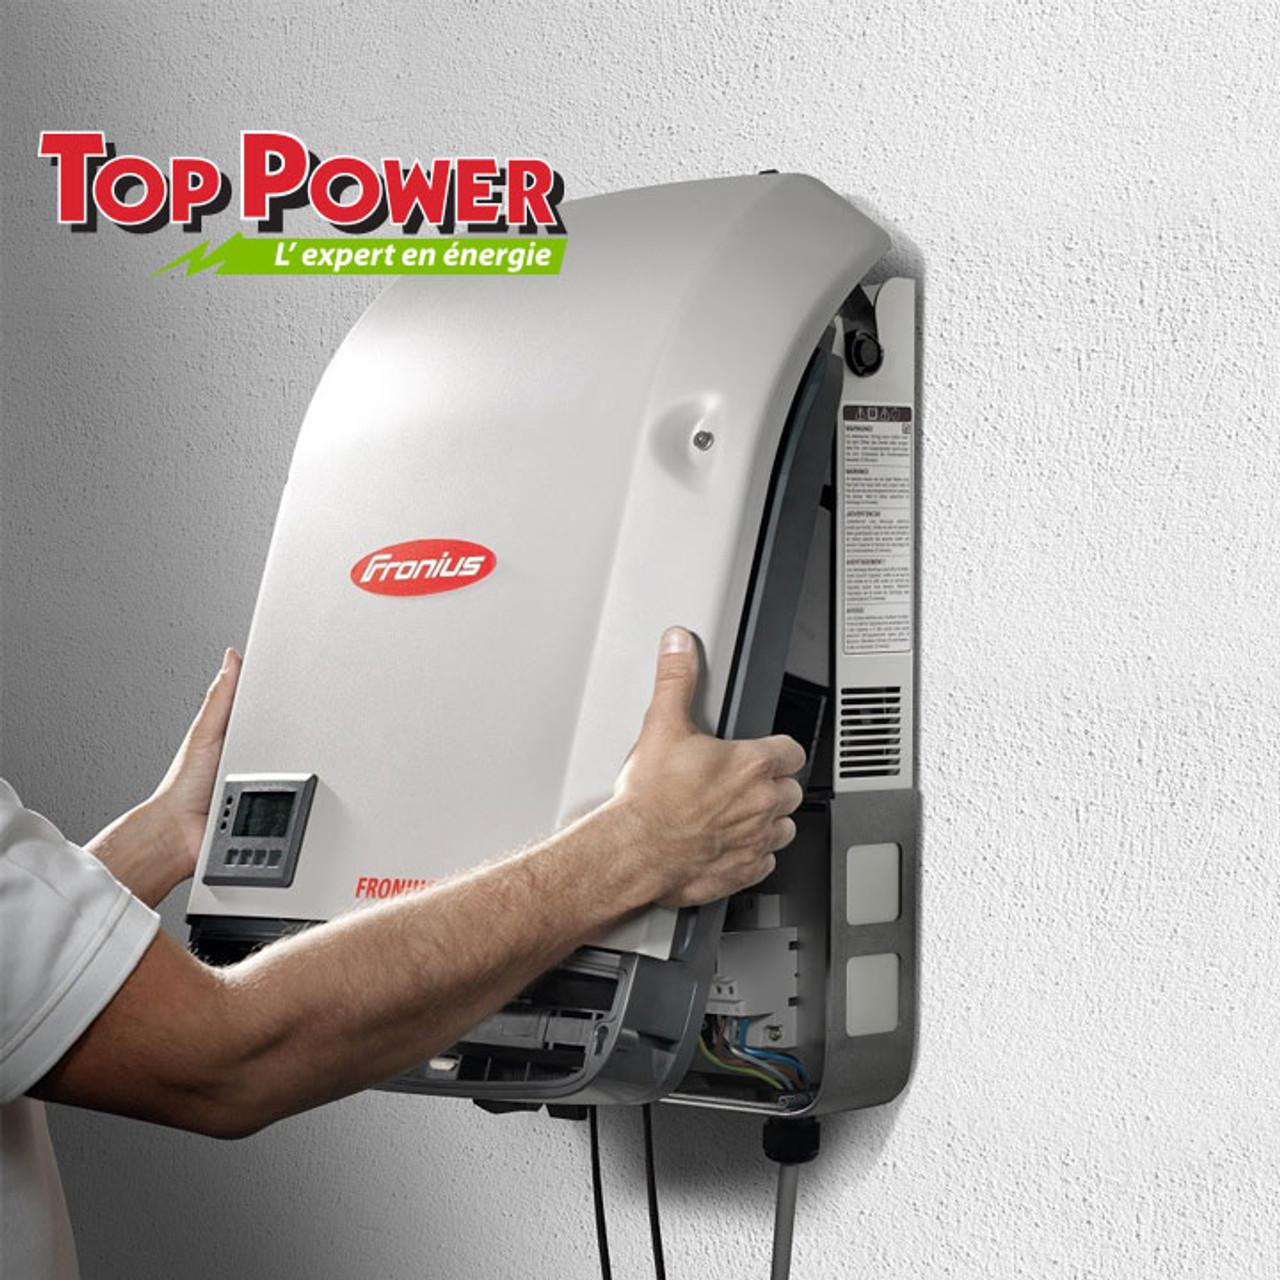 PV Inverter 24Kw Fronius Symo 24 0-3 480 - Top Power Store